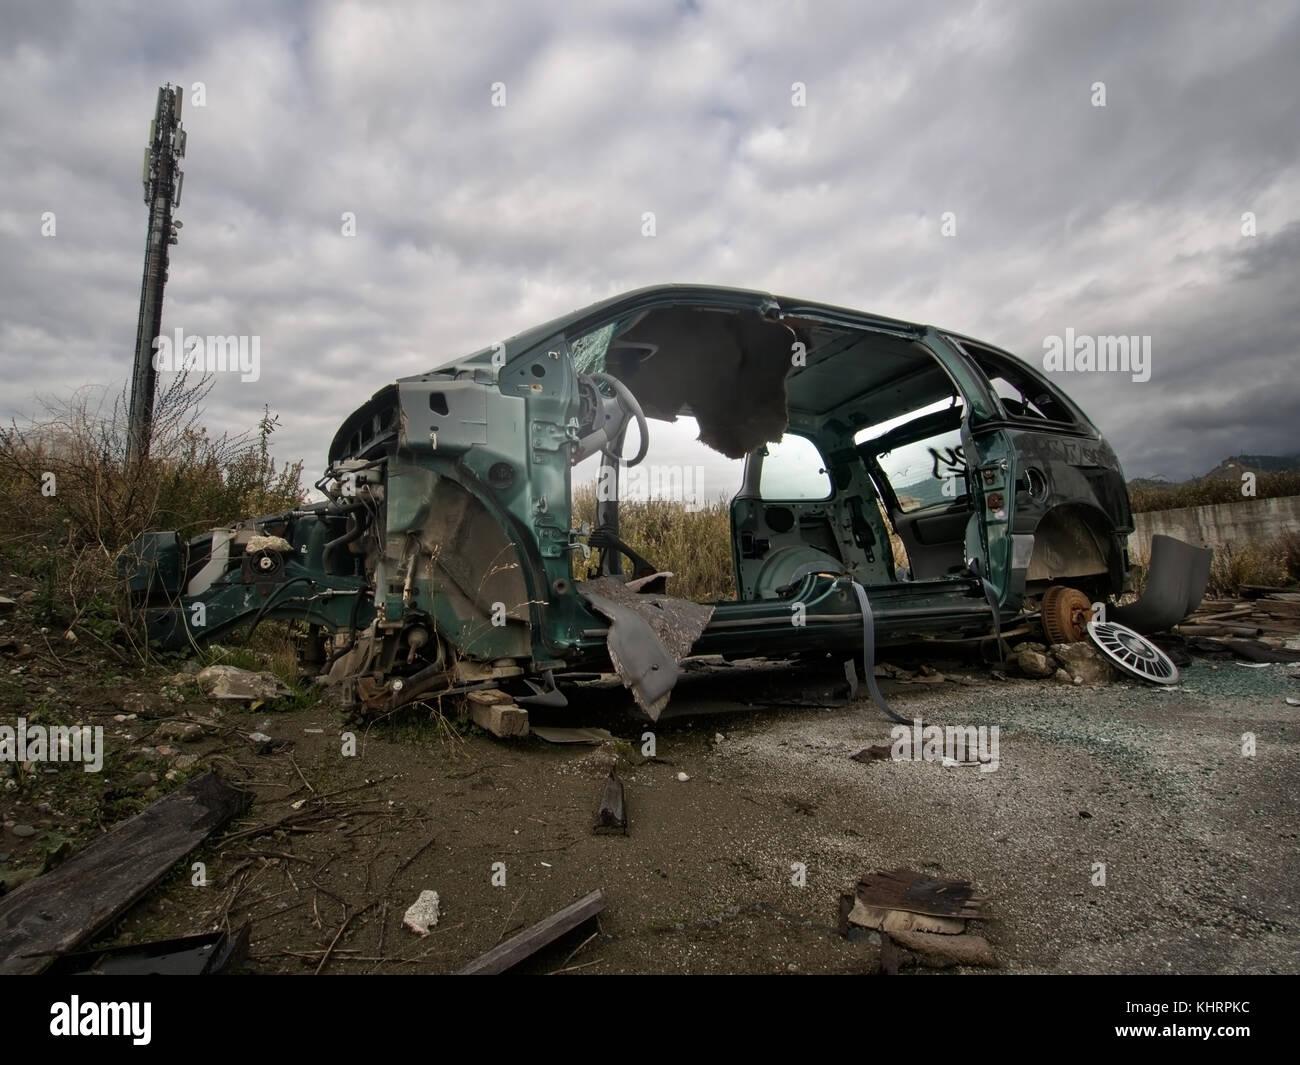 Car. Environmental damage and vandalism. Europe. - Stock Image